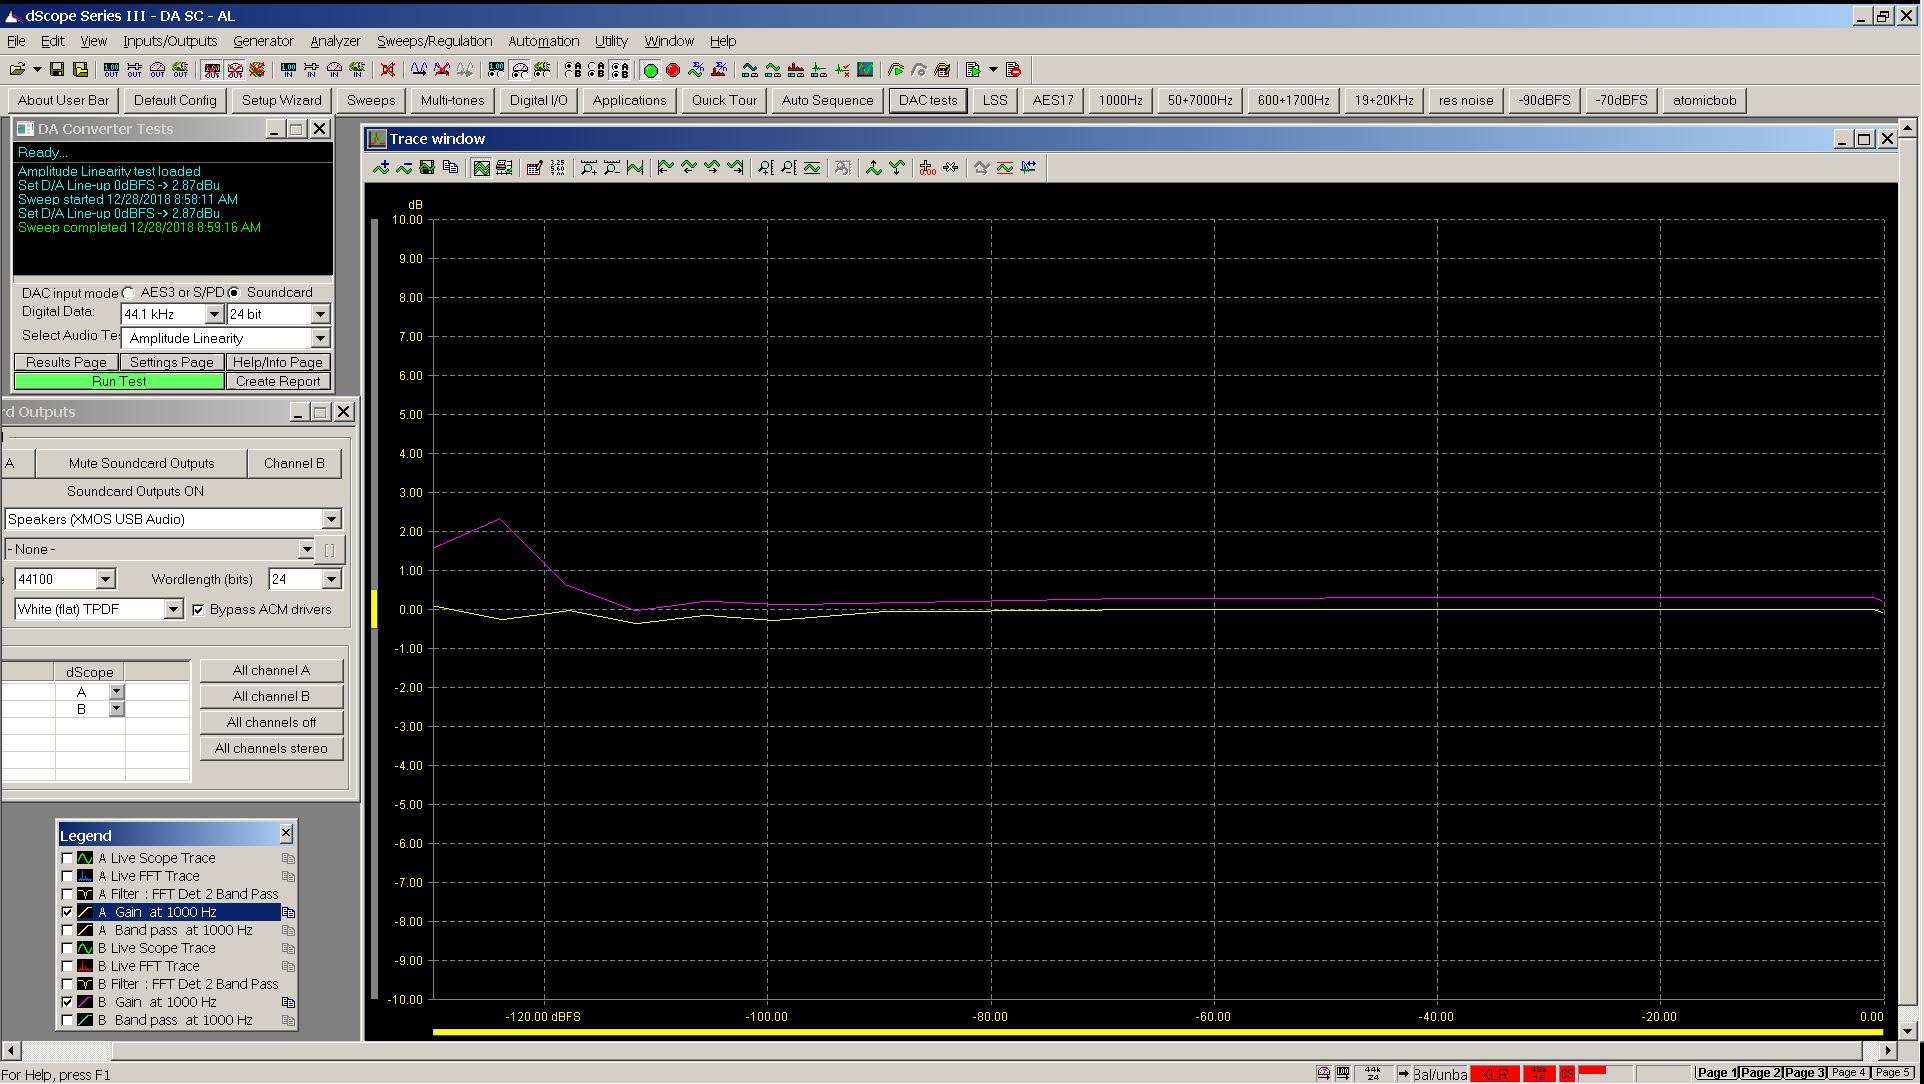 20181227-11 convert2 Bal 1 KHz gain linearity - USB.PNG